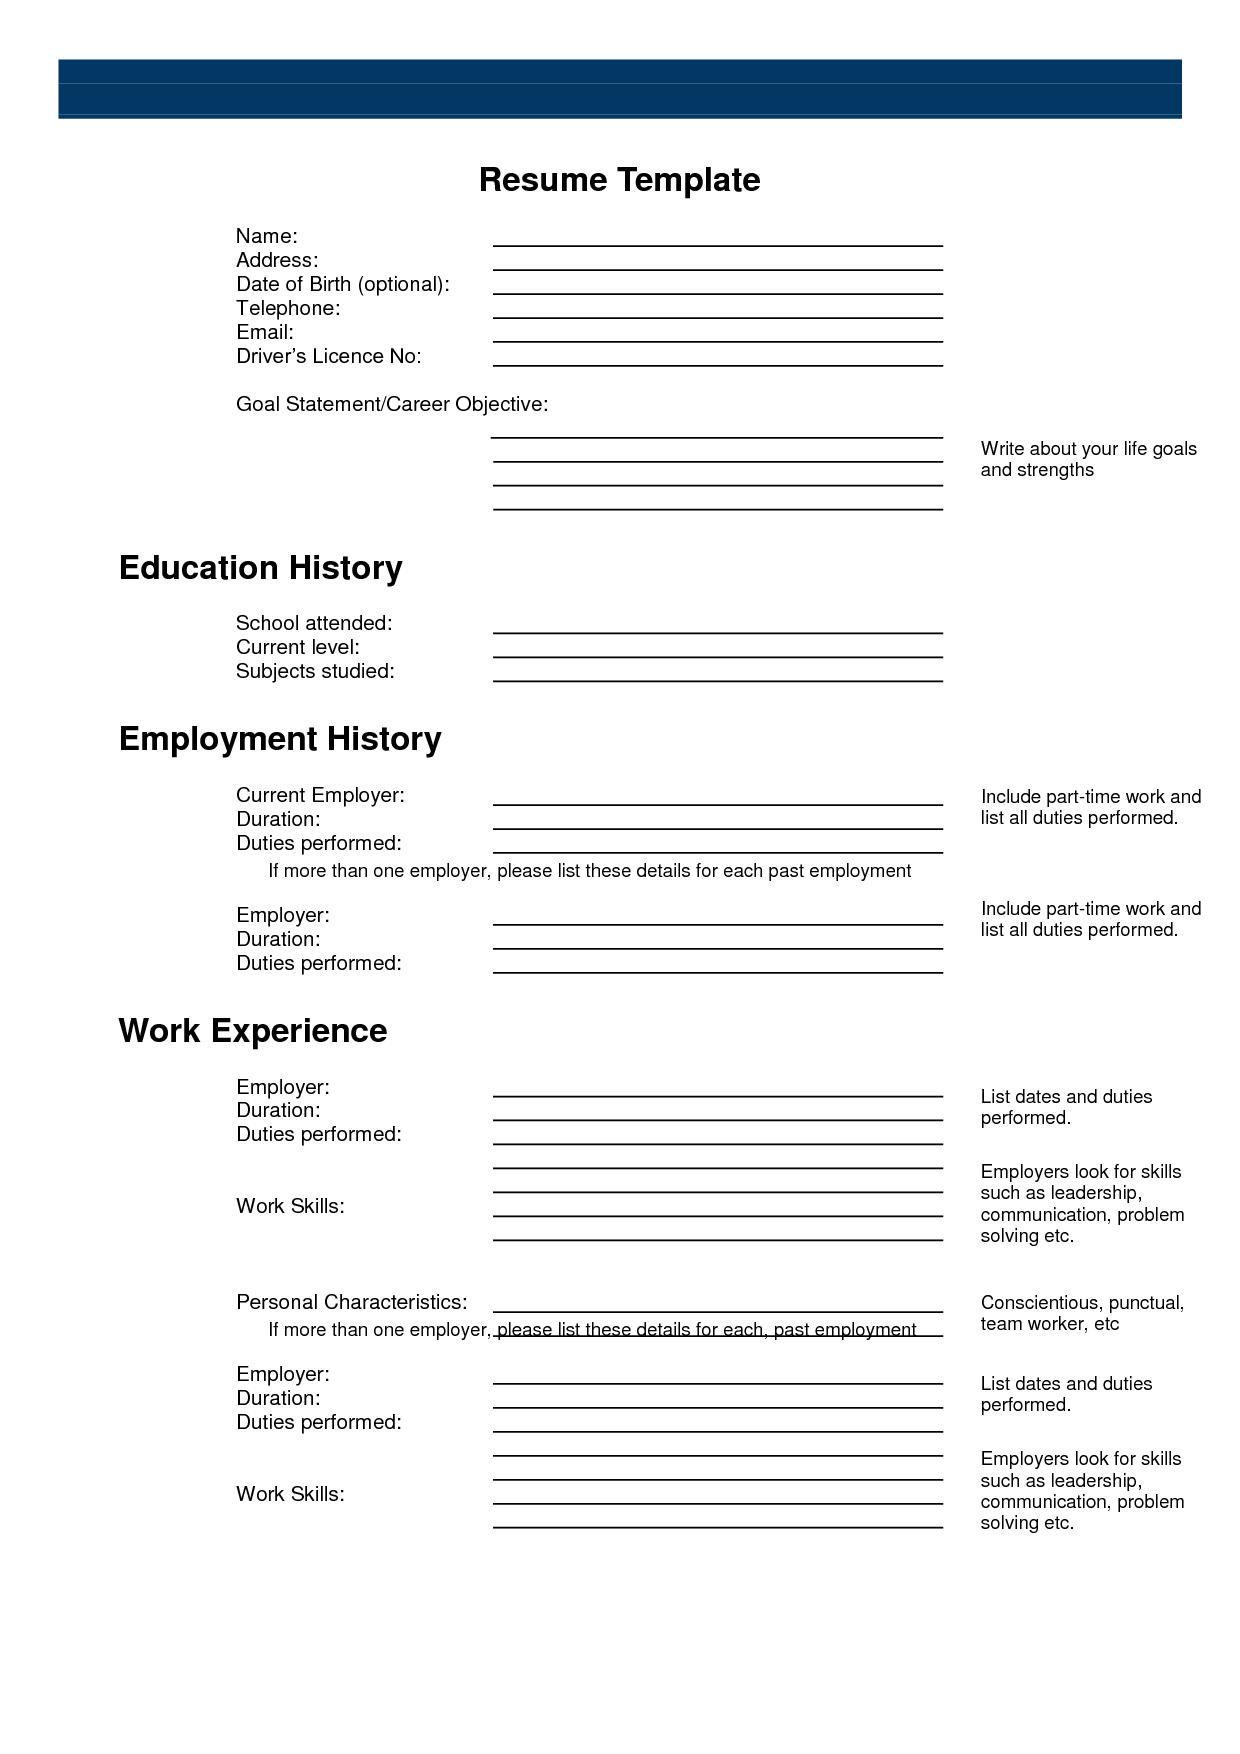 Free Printable Sample Resume Templates Resumecareer